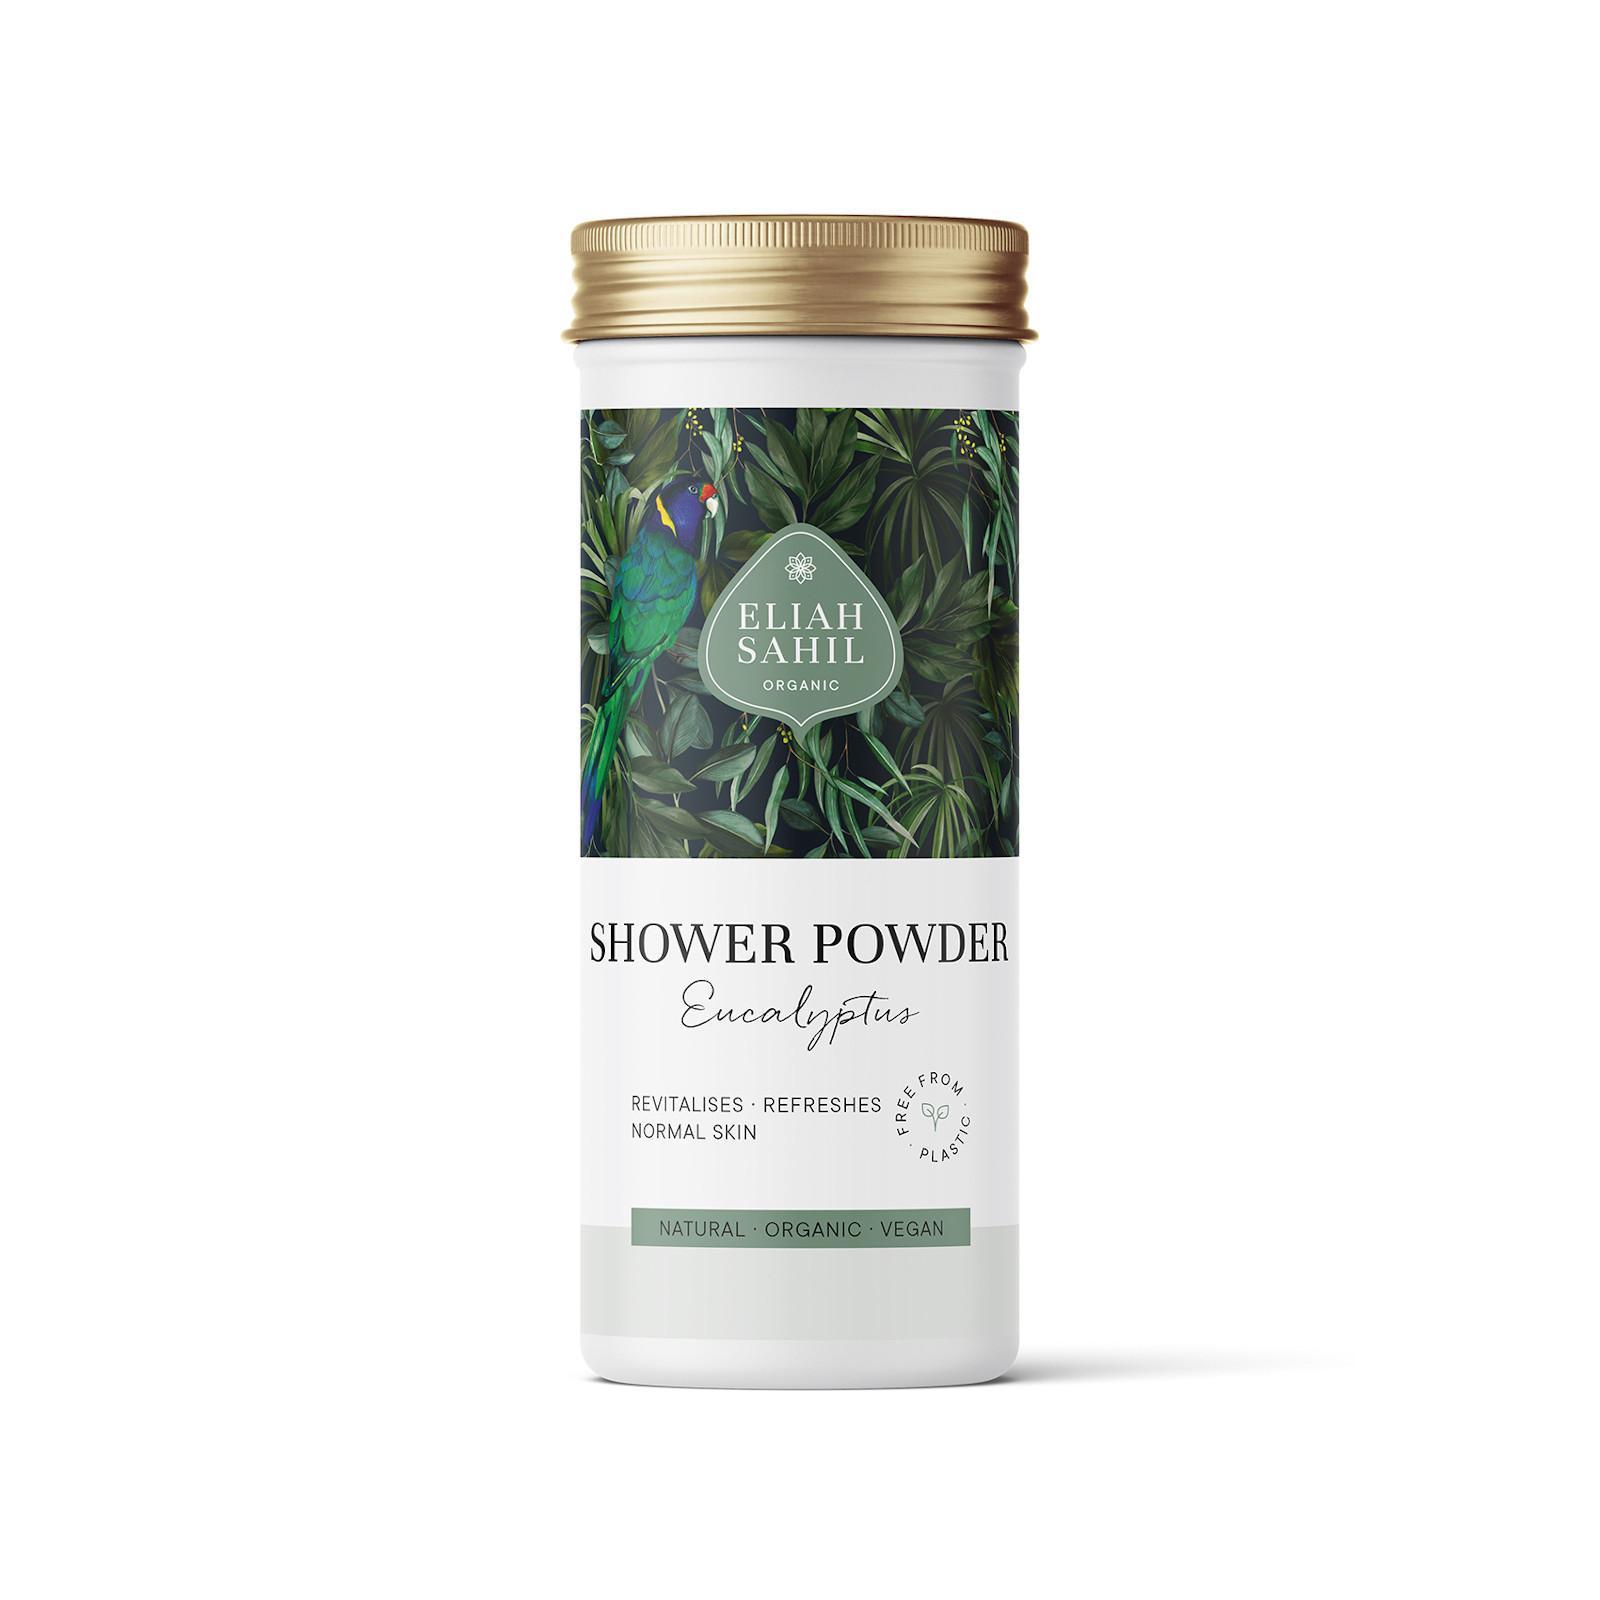 Eliah Sahil Organic Sprchový prášek eukalyptus 90 g, box